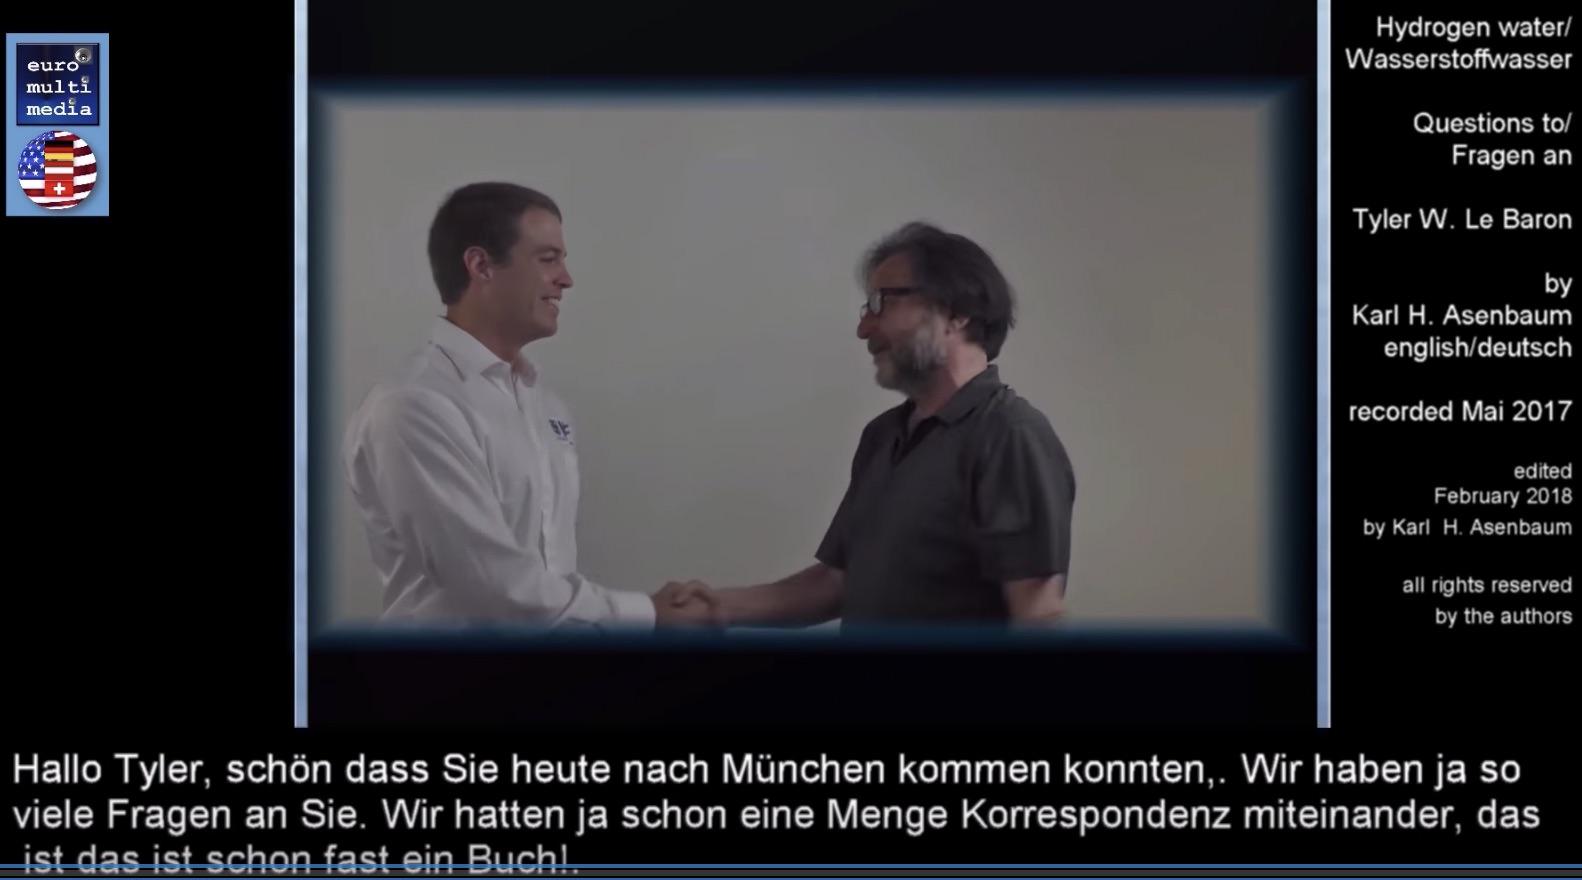 Tyler Le Baron in Munich interview by Karl Heinz Asenbaum Hydrogen Water